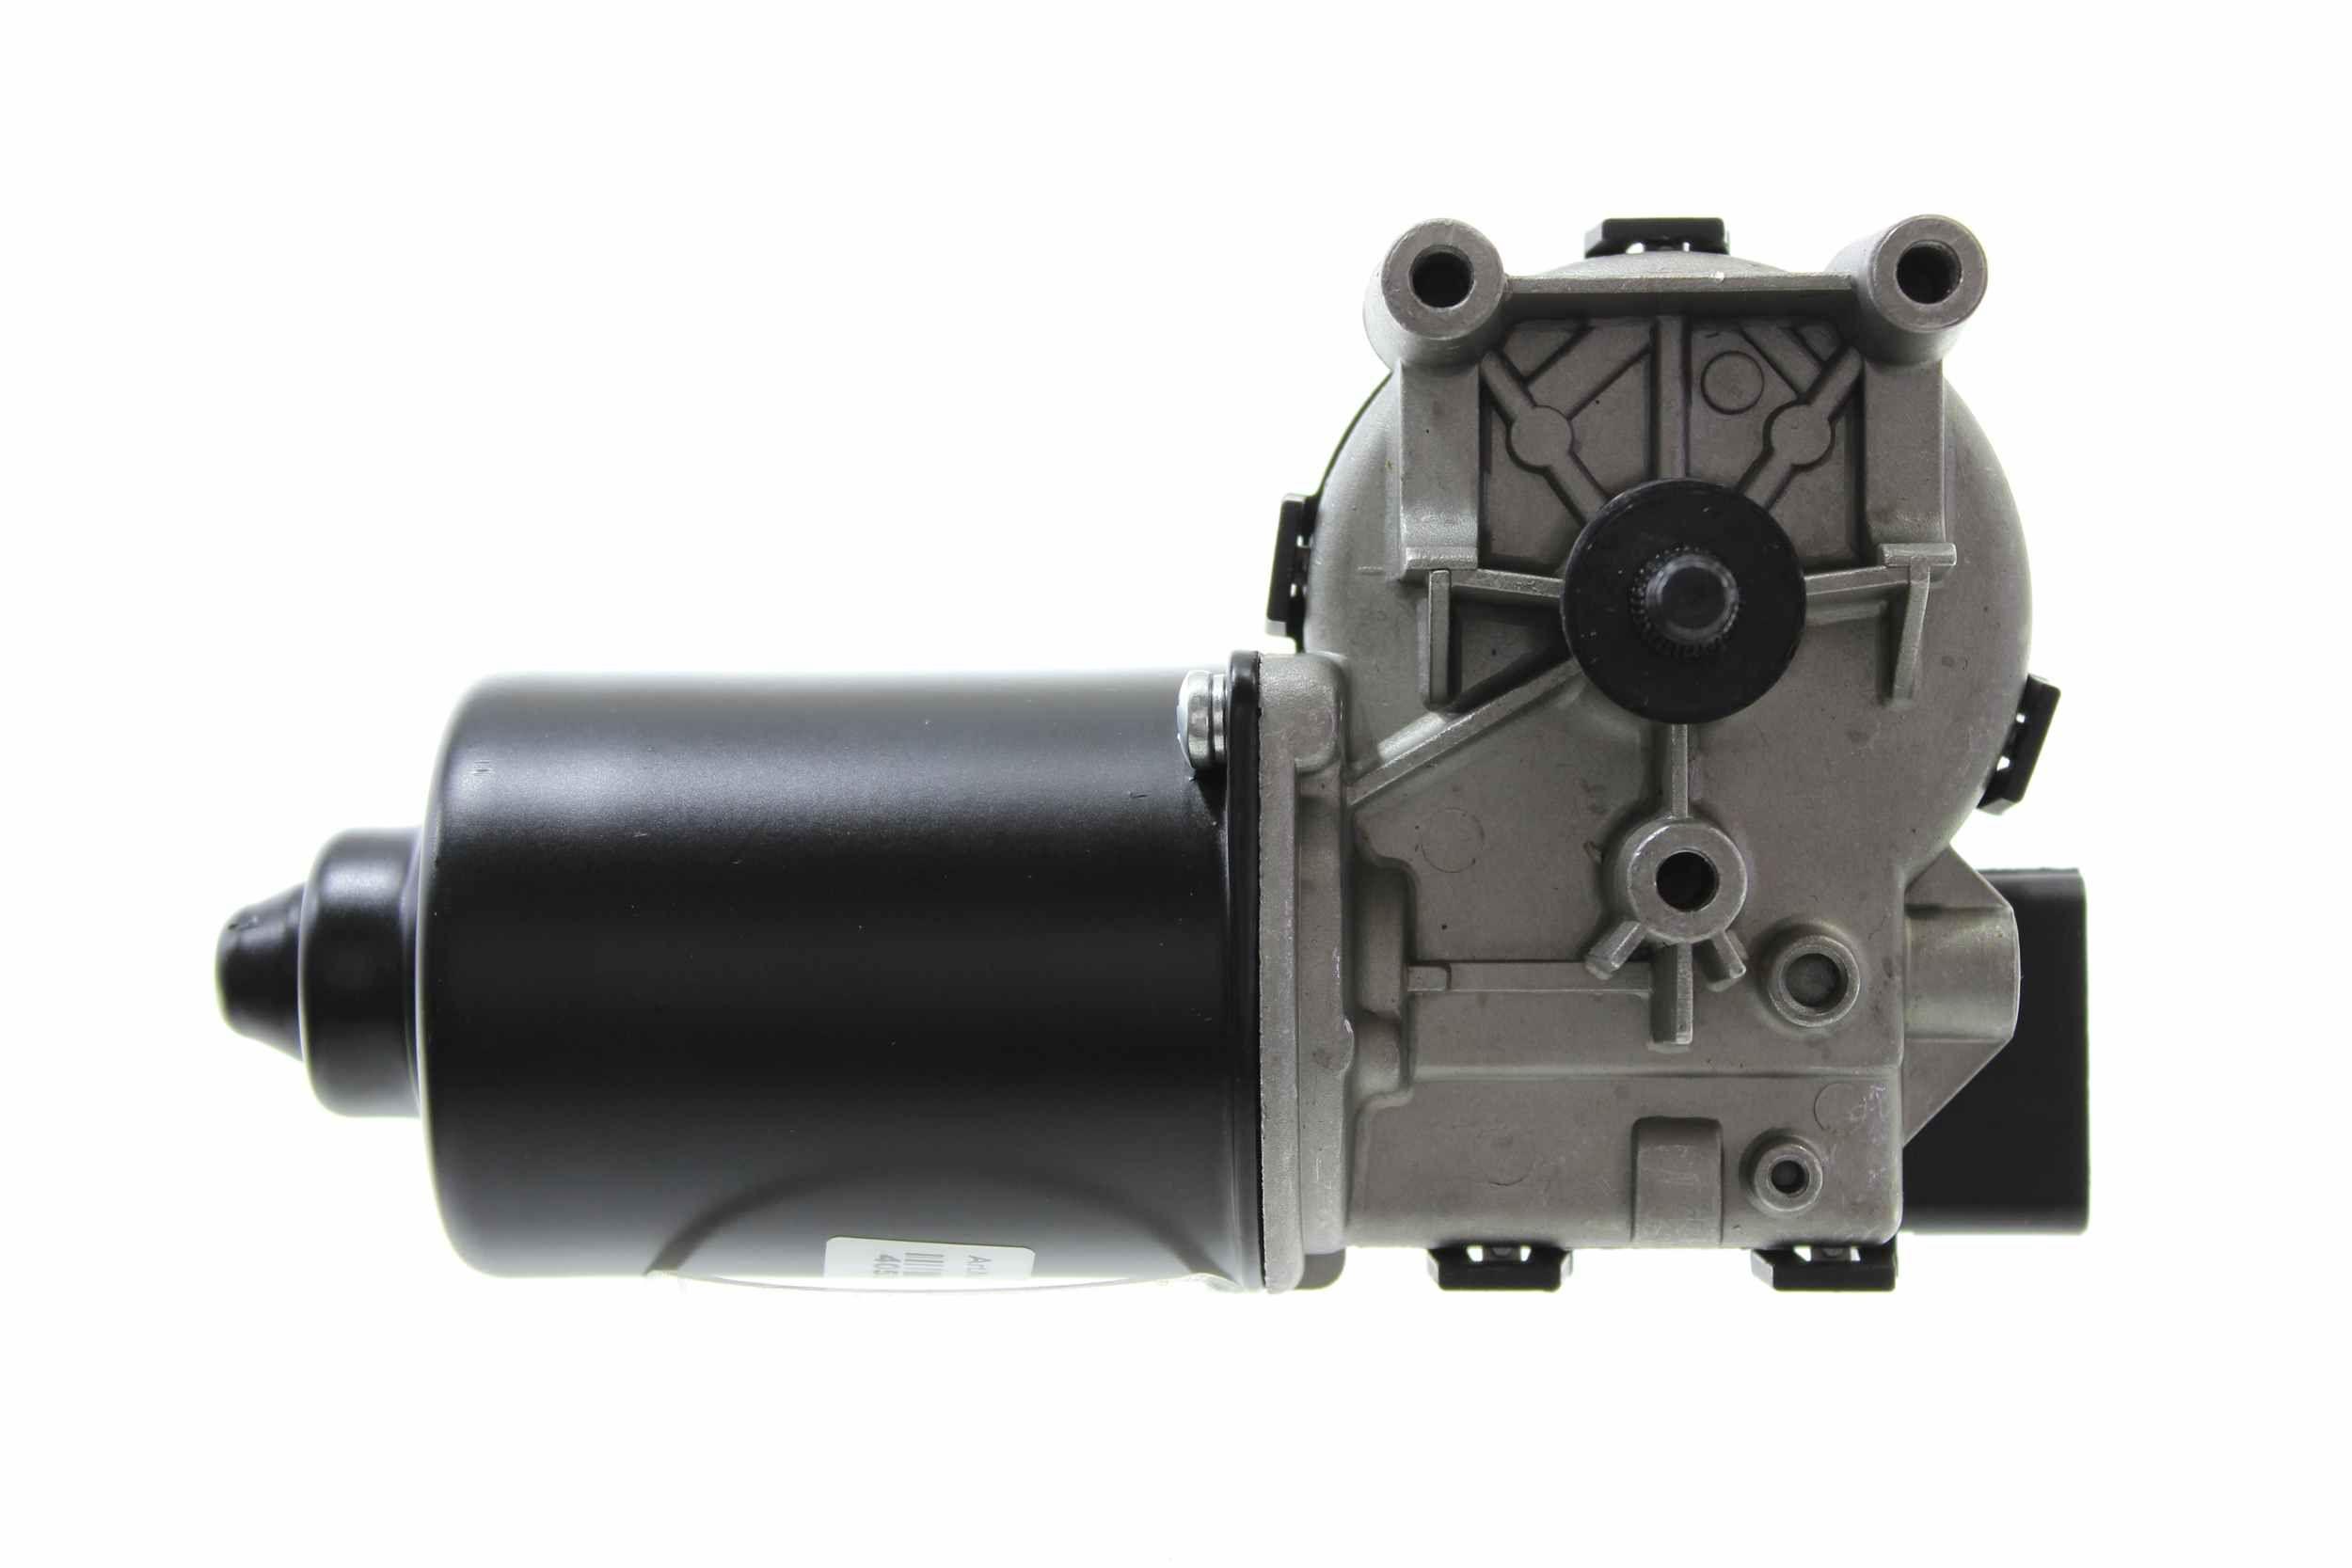 Windshield Wiper Motor 10800909 ALANKO 10800909 original quality